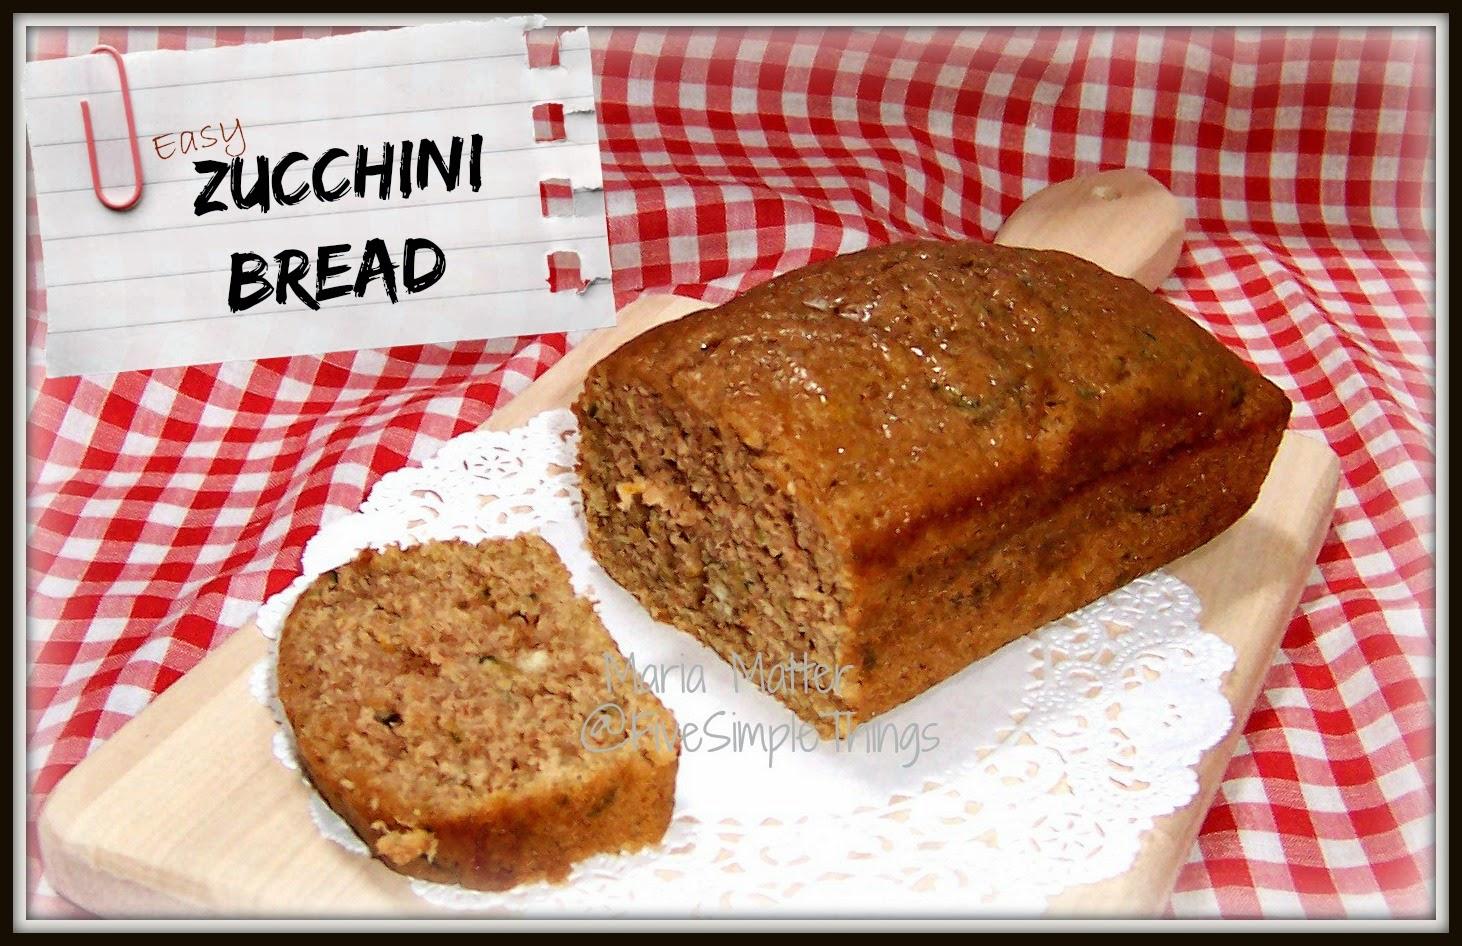 Five Simple Things: Super Moist Zucchini Bread - printable recipe